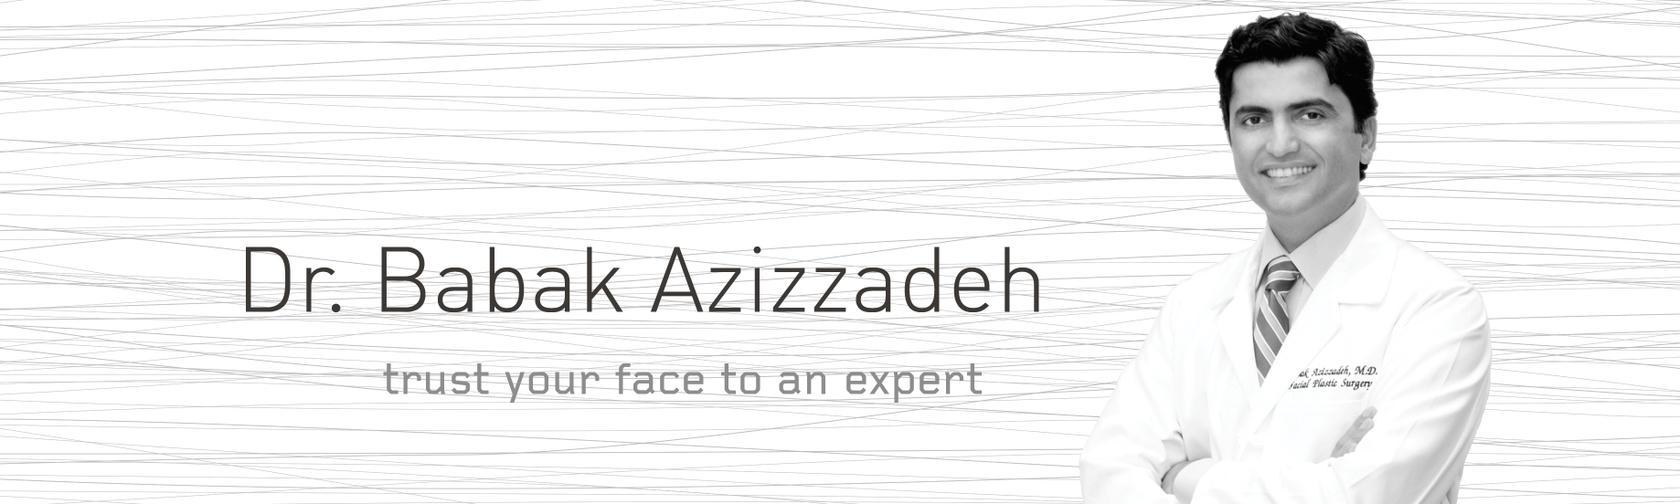 Dr. Babak Azizzadeh